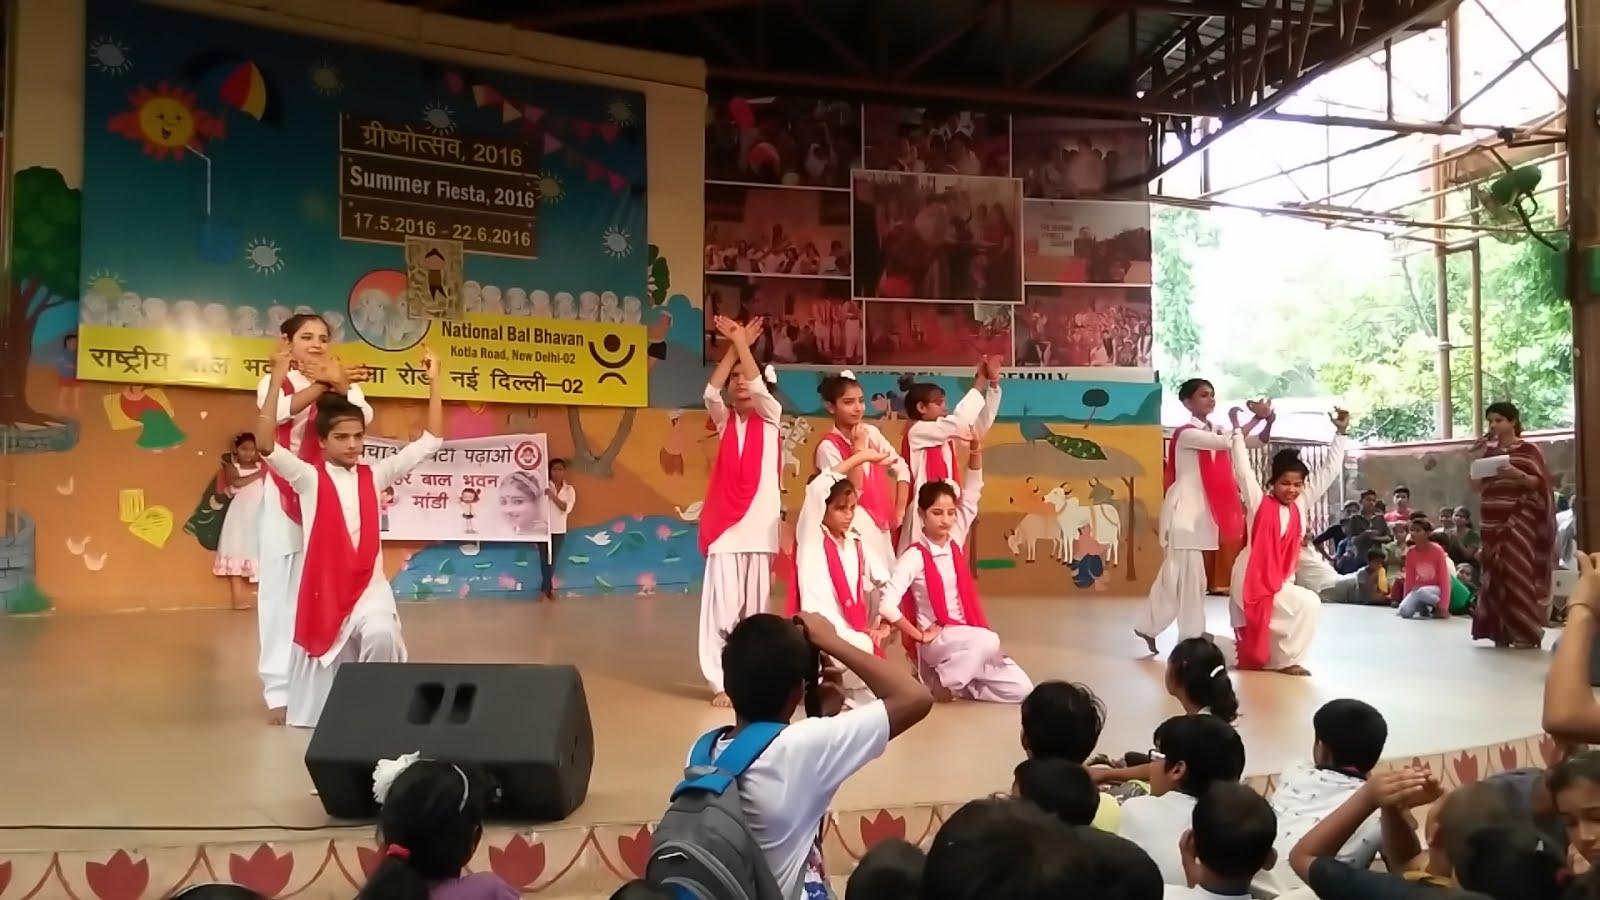 Presentation at National Bal Bhavan